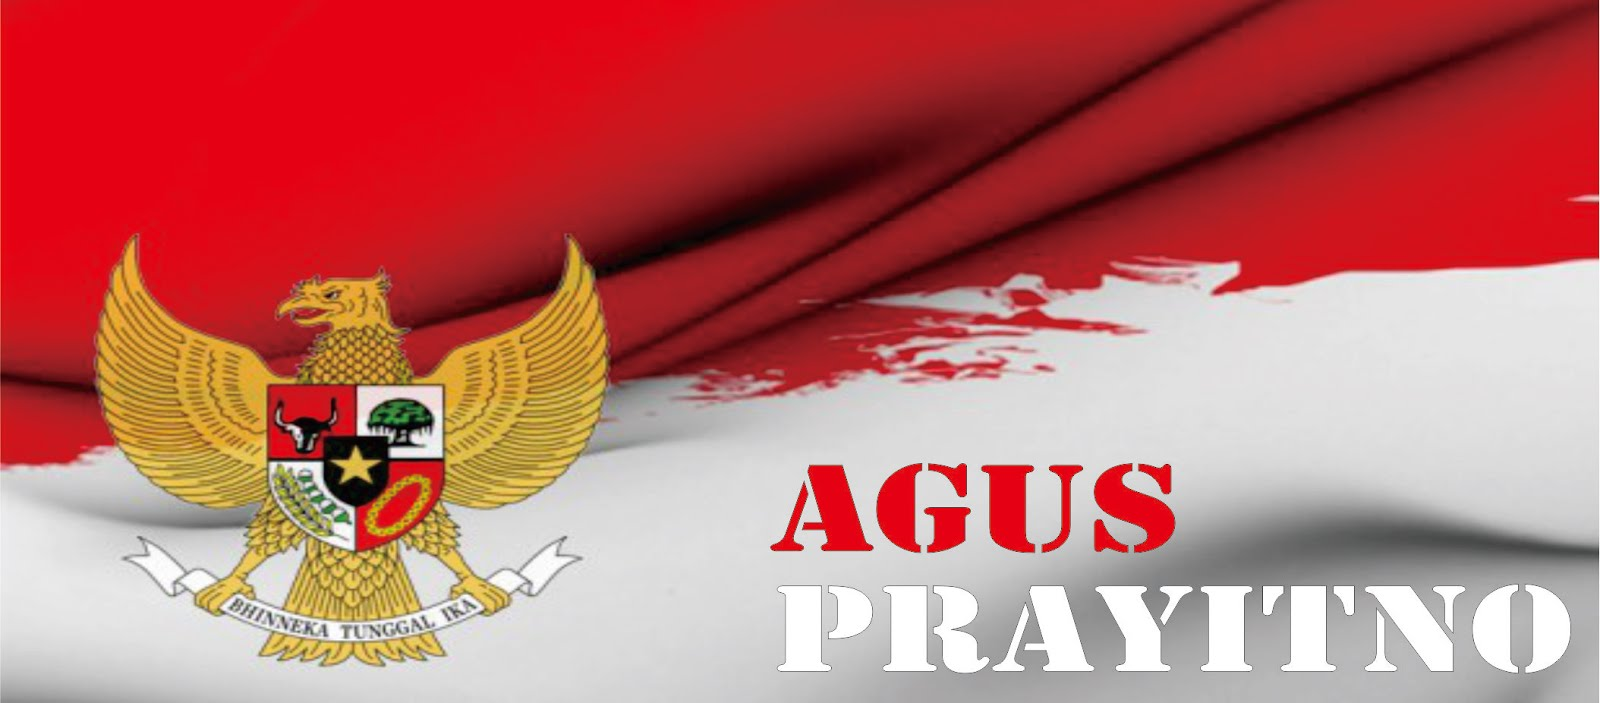 Agus Prayitno